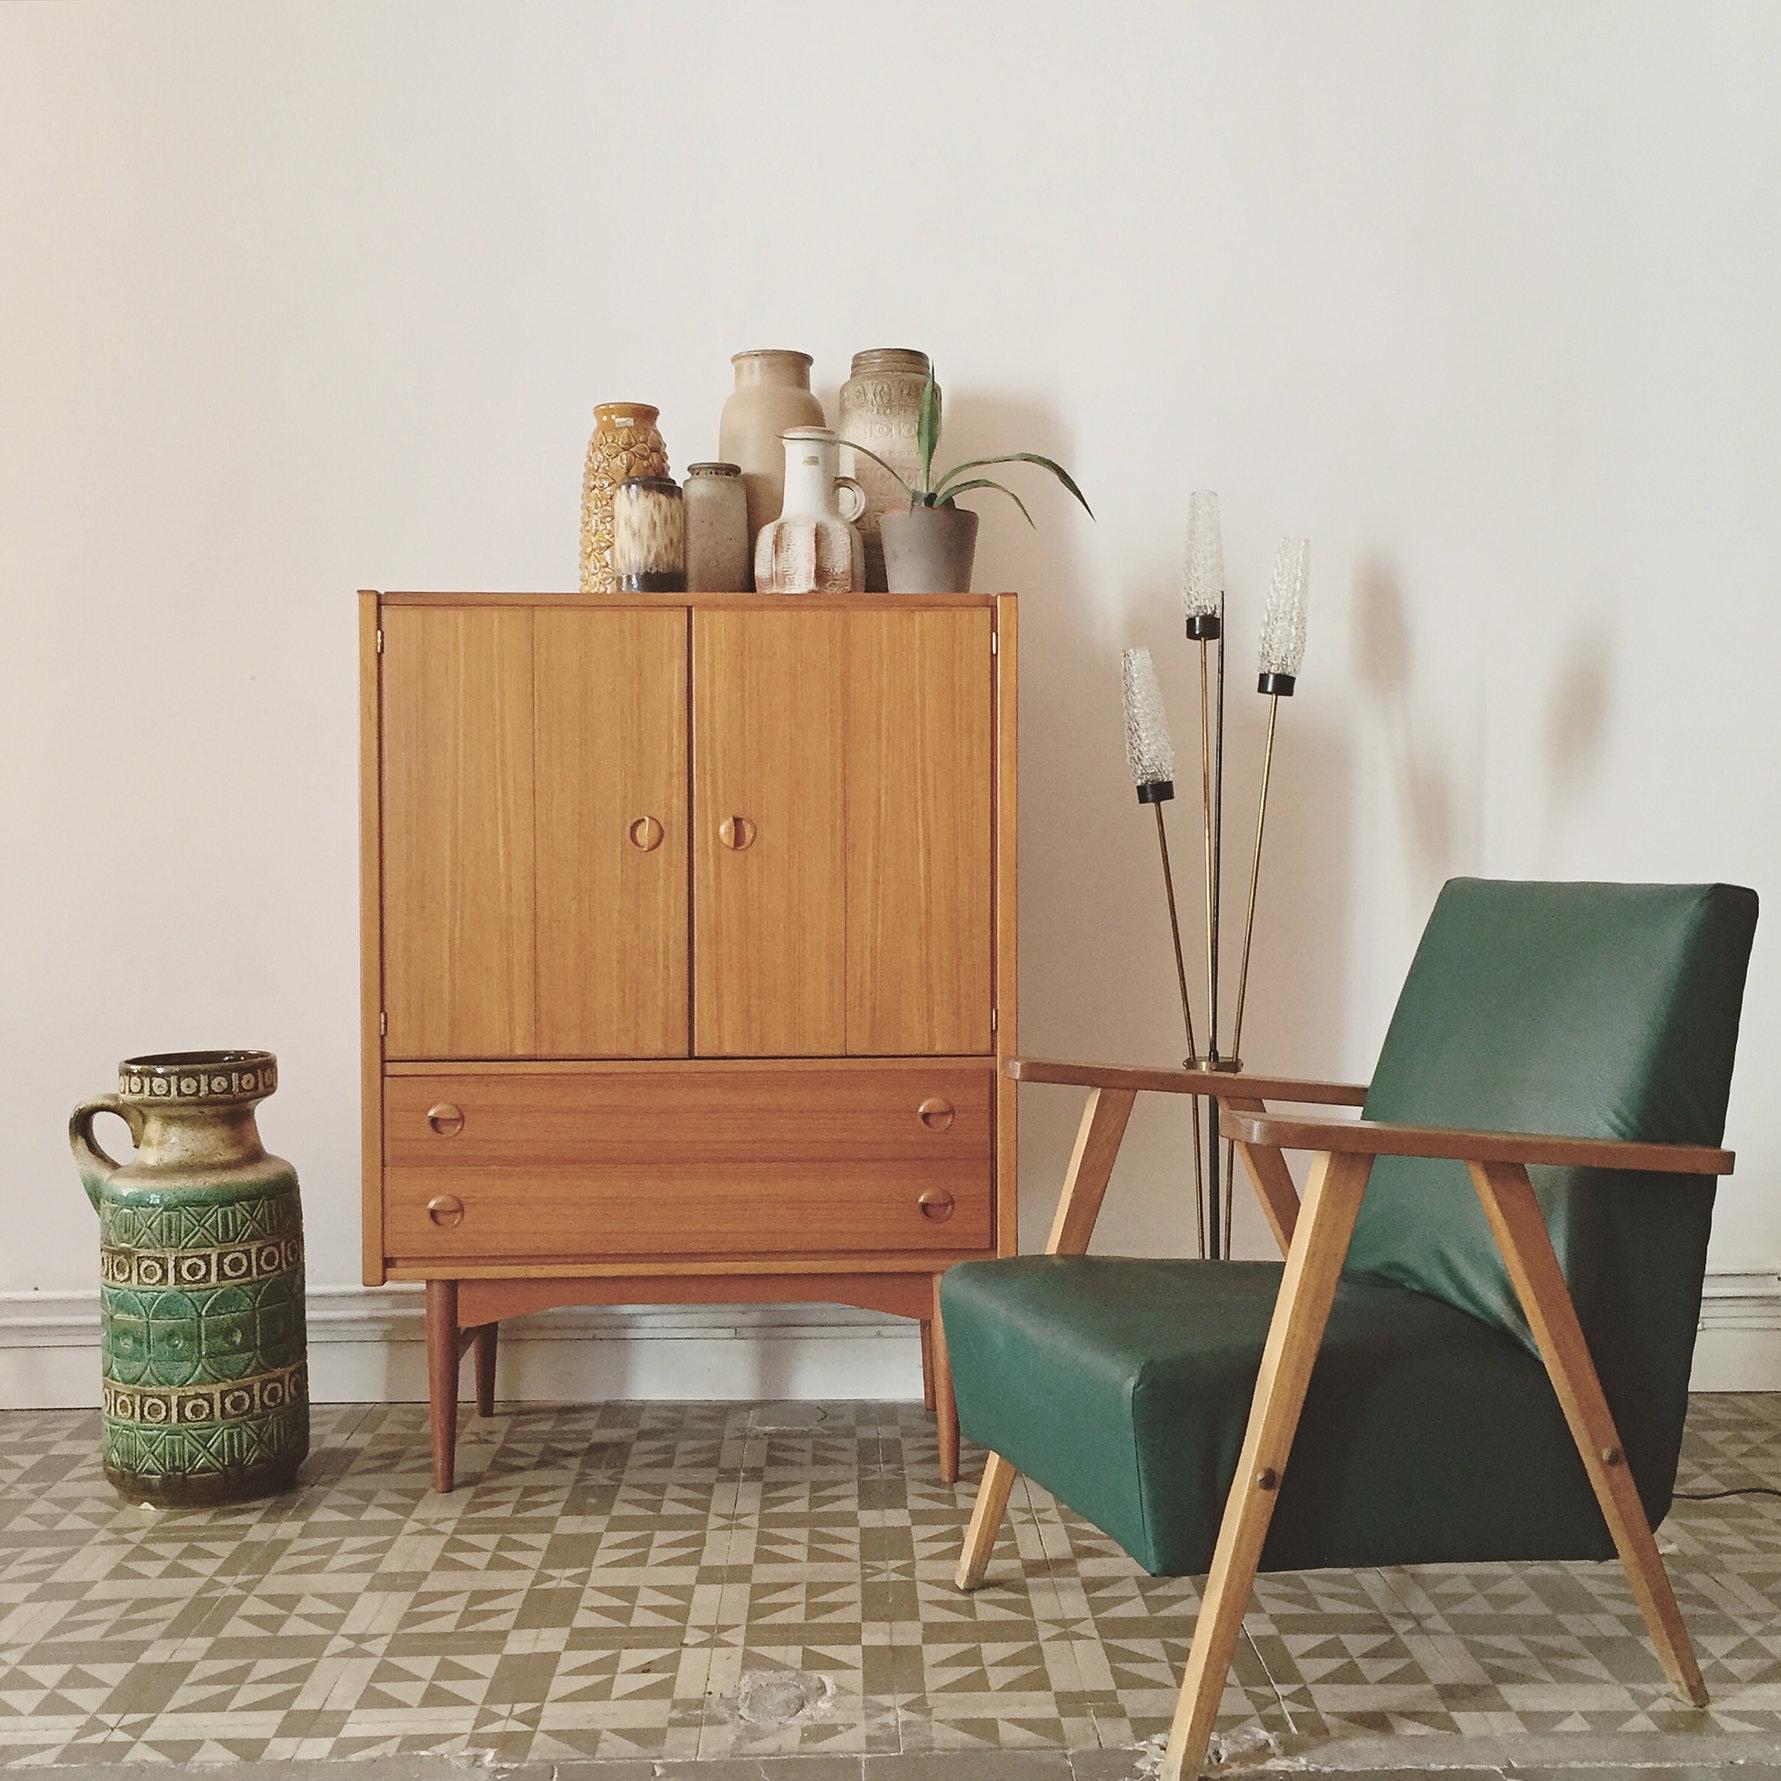 Cheznousbcn muebles y objetos vintage en barcelona - Muebles vintage en barcelona ...